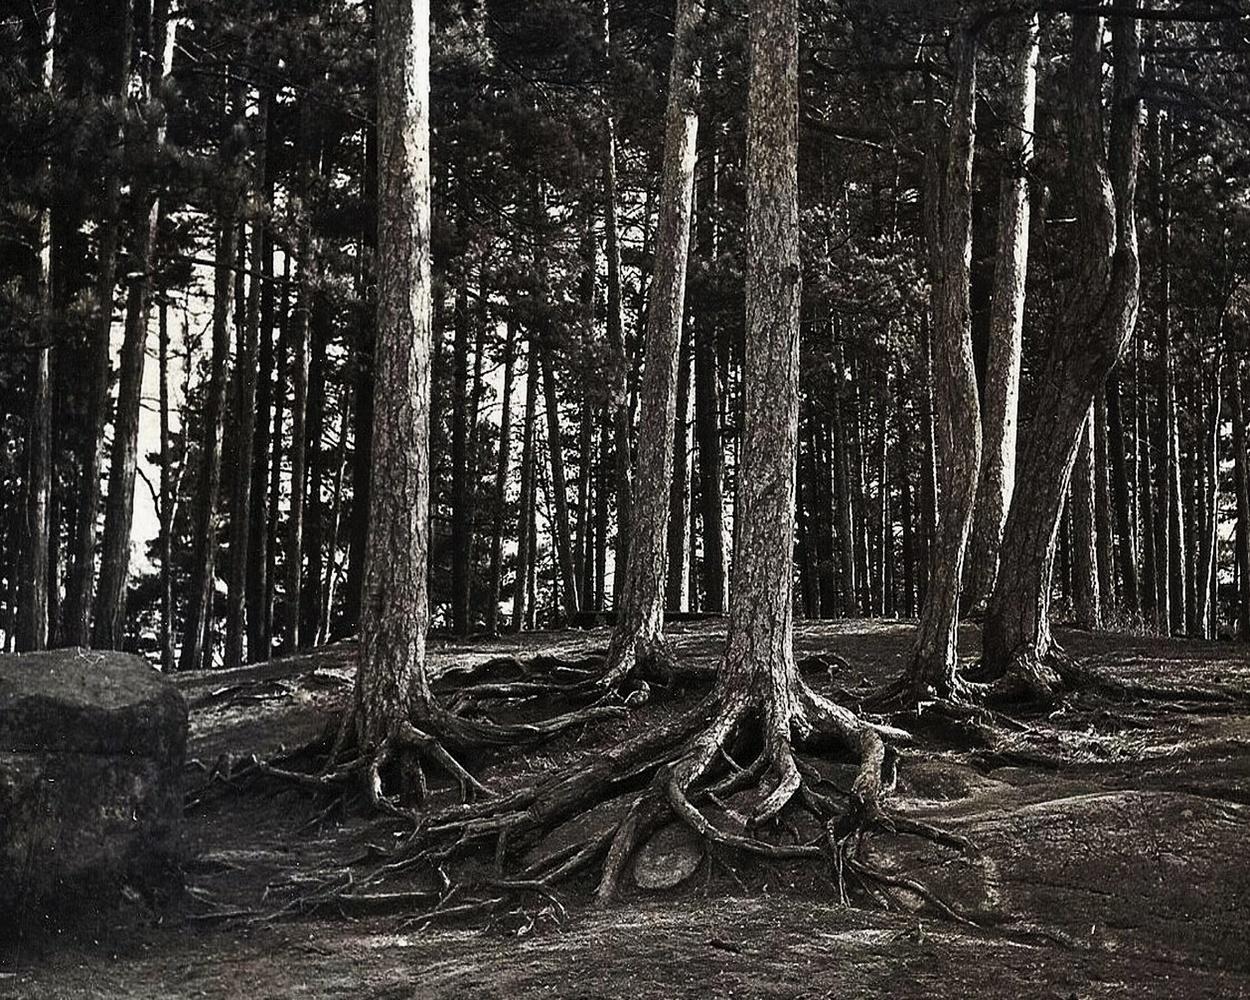 Adirondack Roots by Michael Warner